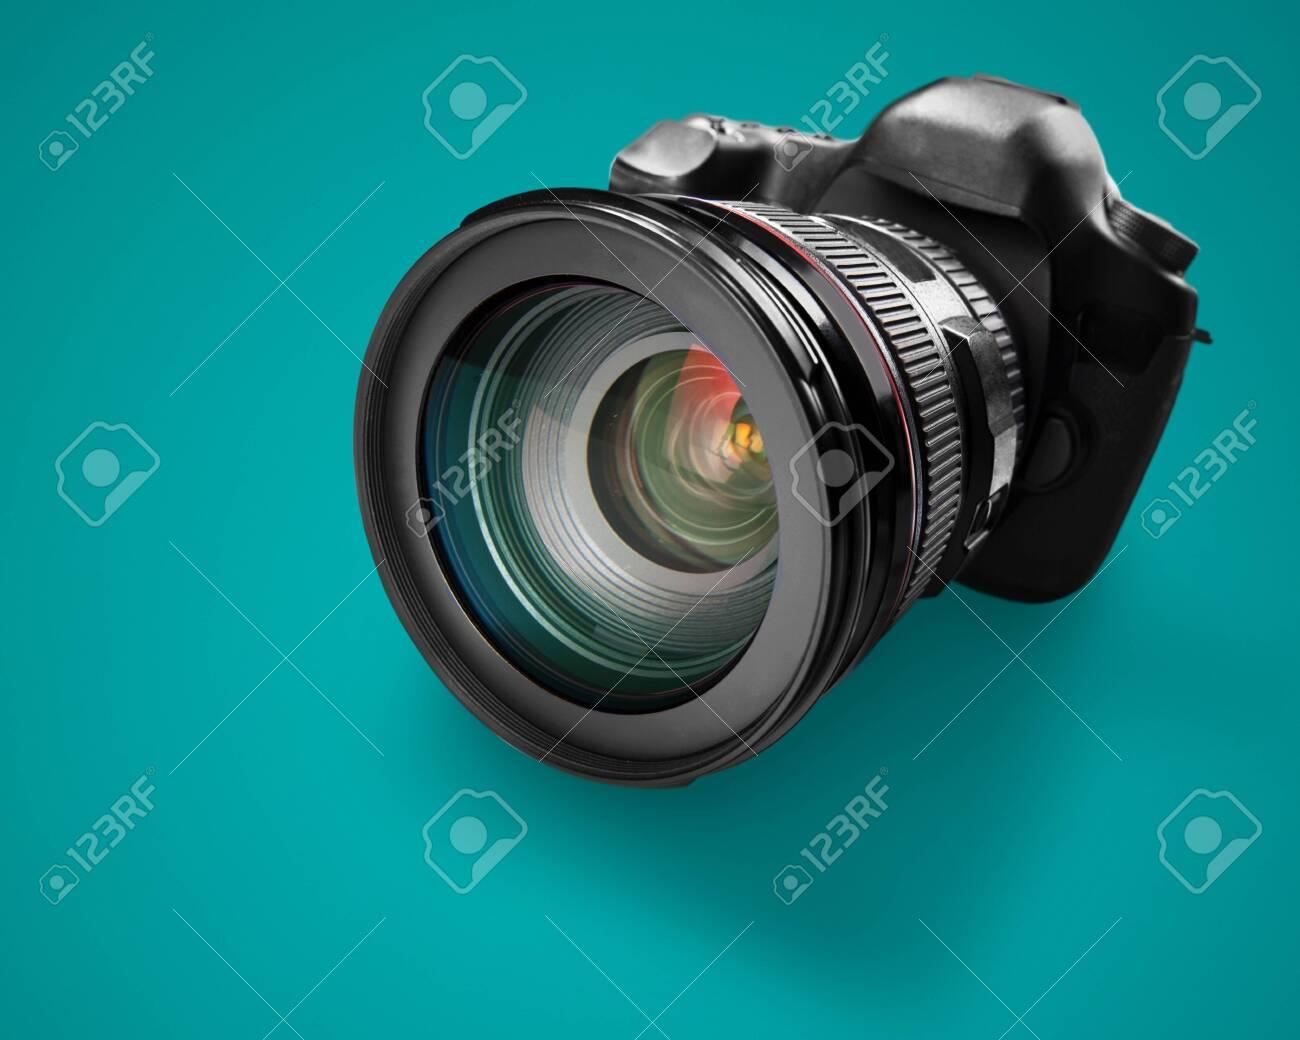 Black camera on green background - 128026993